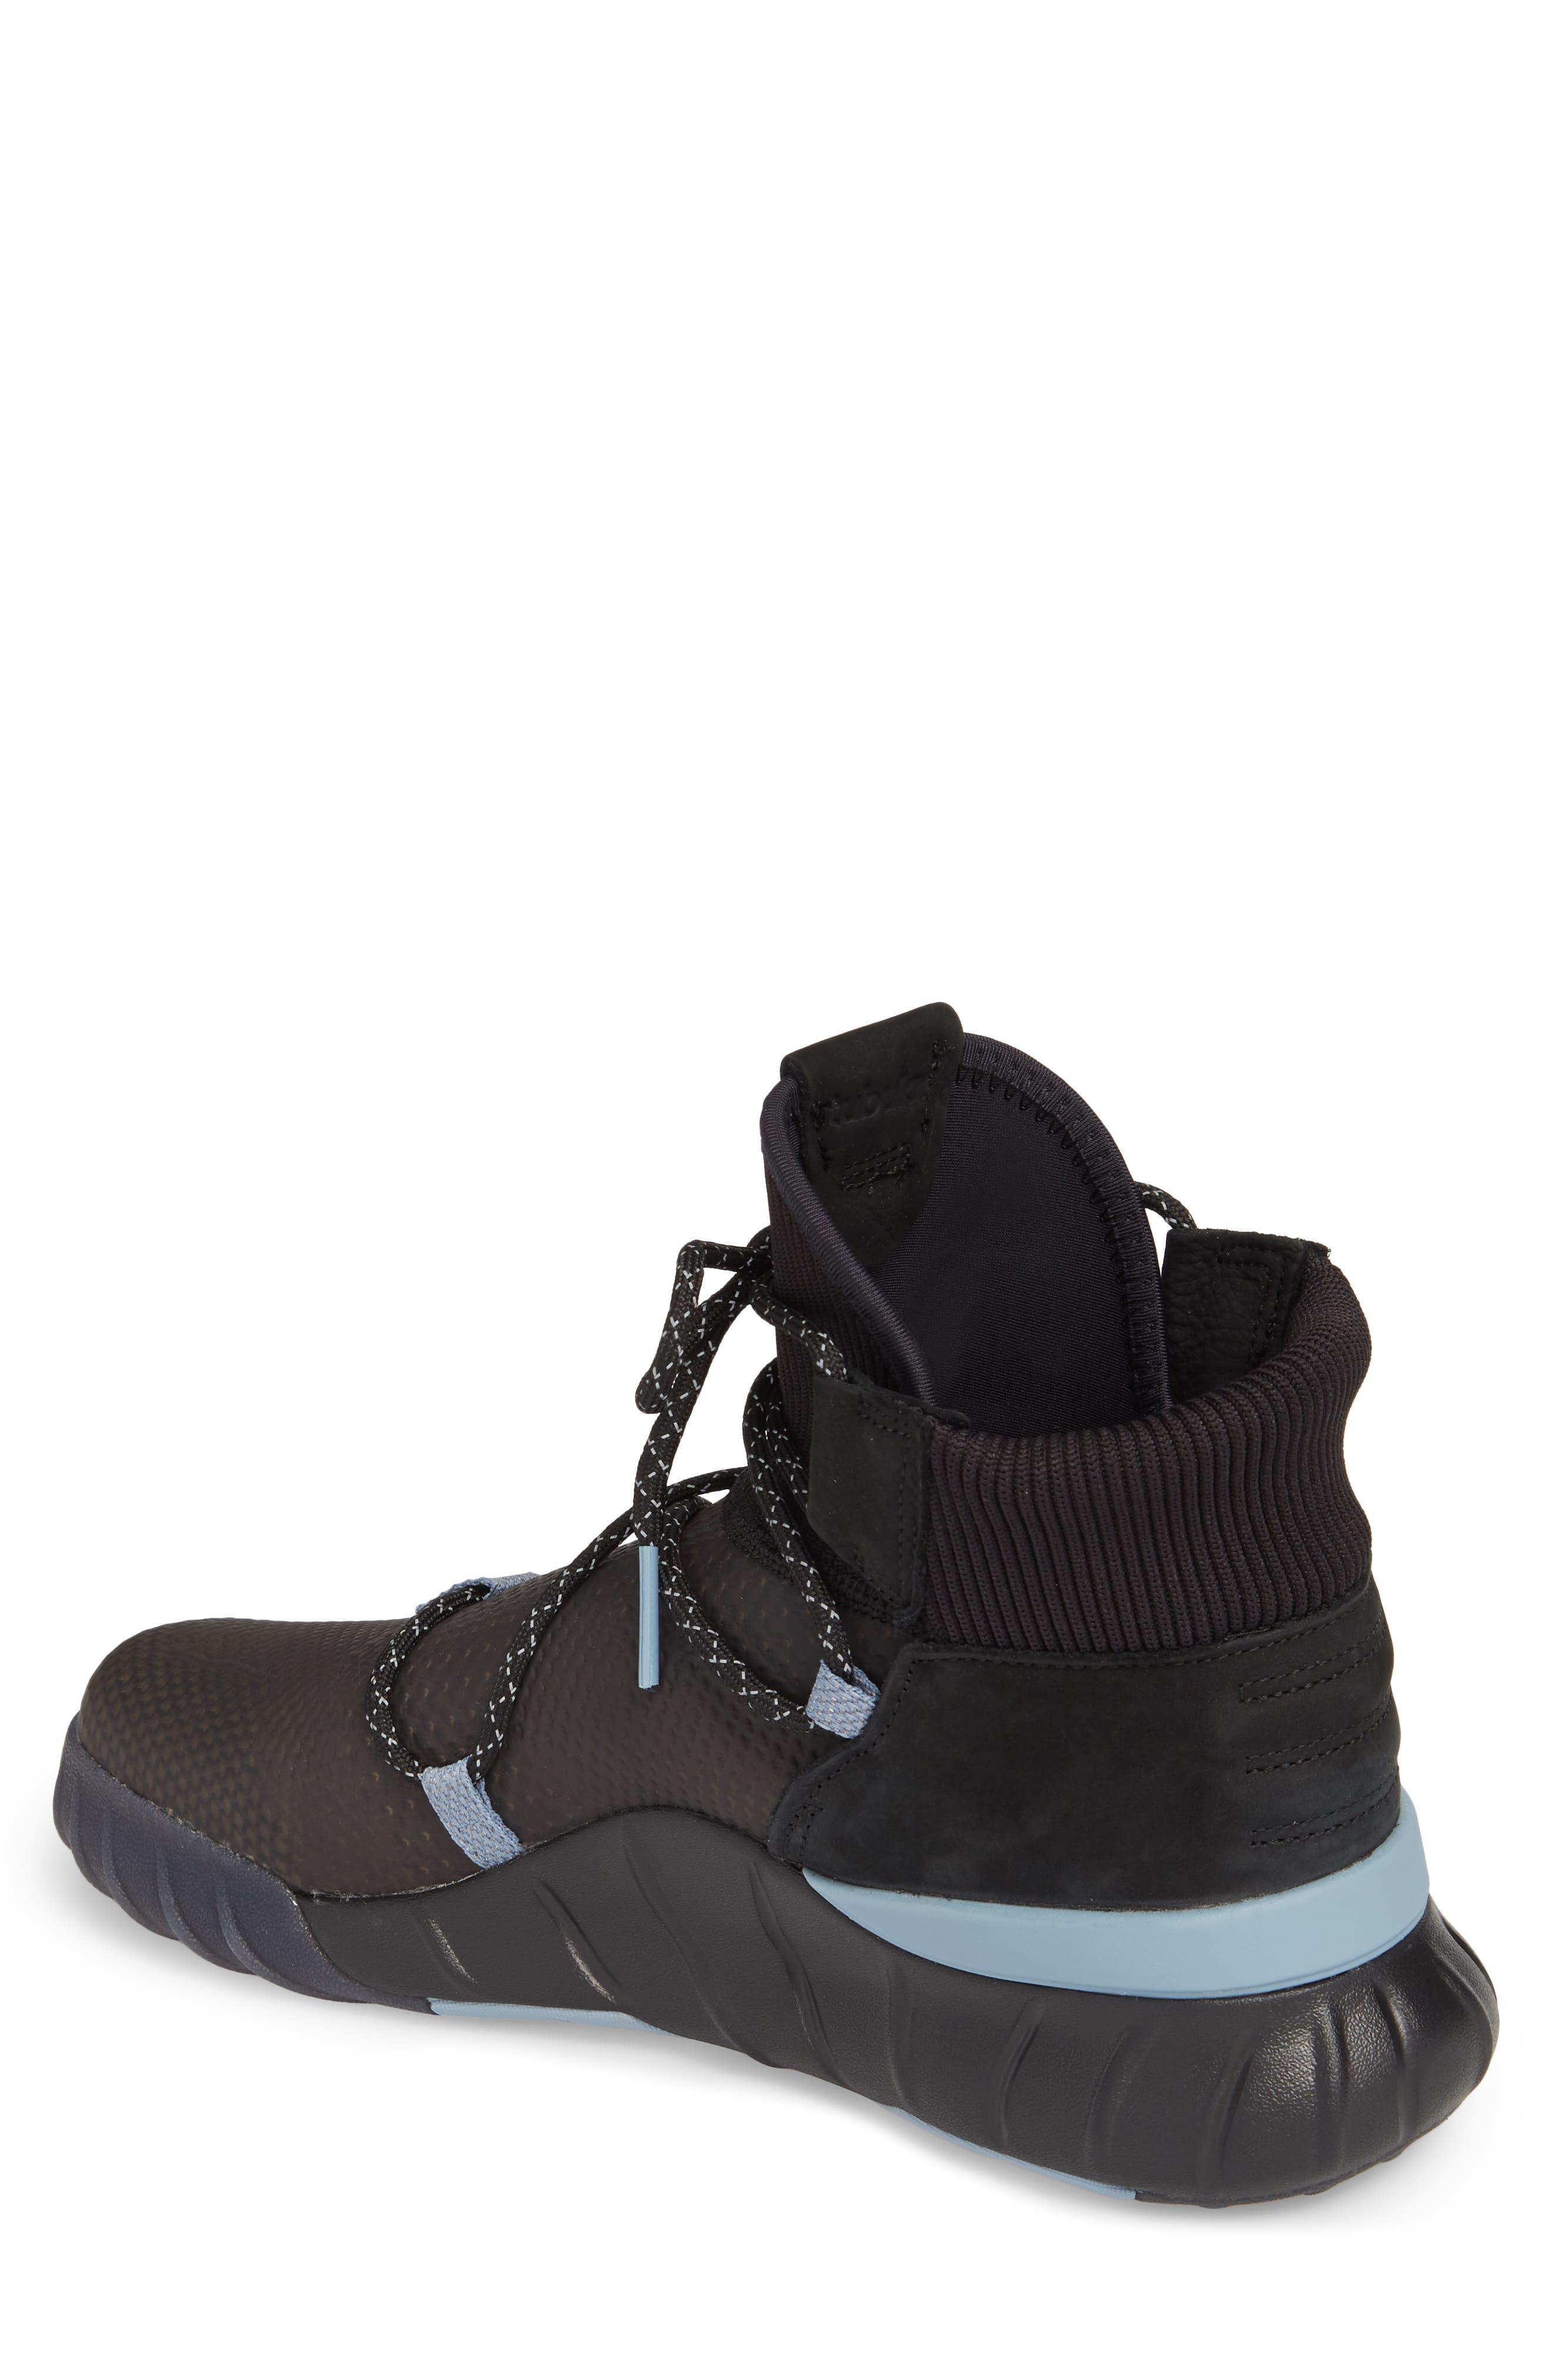 Tubular X 2.0 PK Sneaker,                             Alternate thumbnail 2, color,                             001